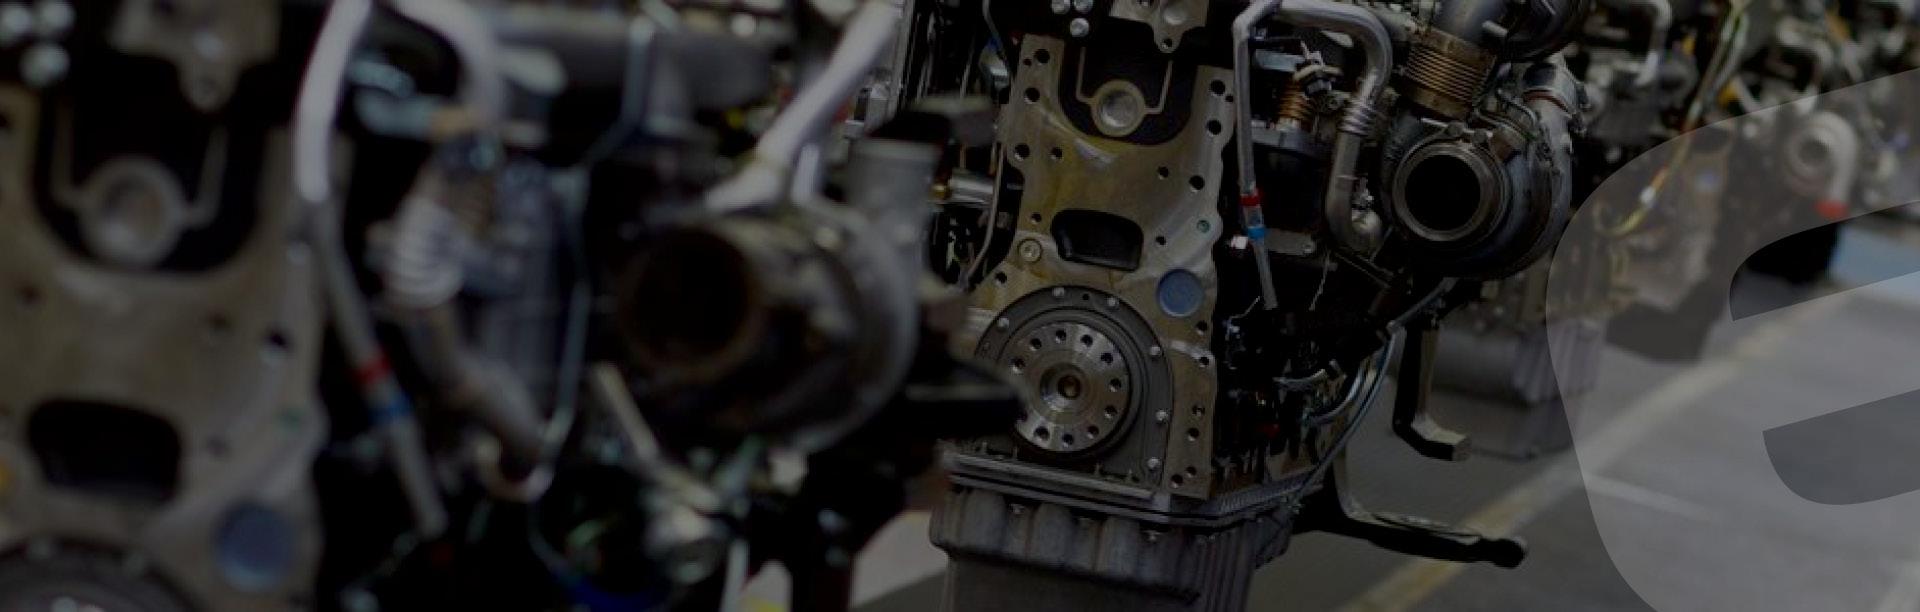 engine australia